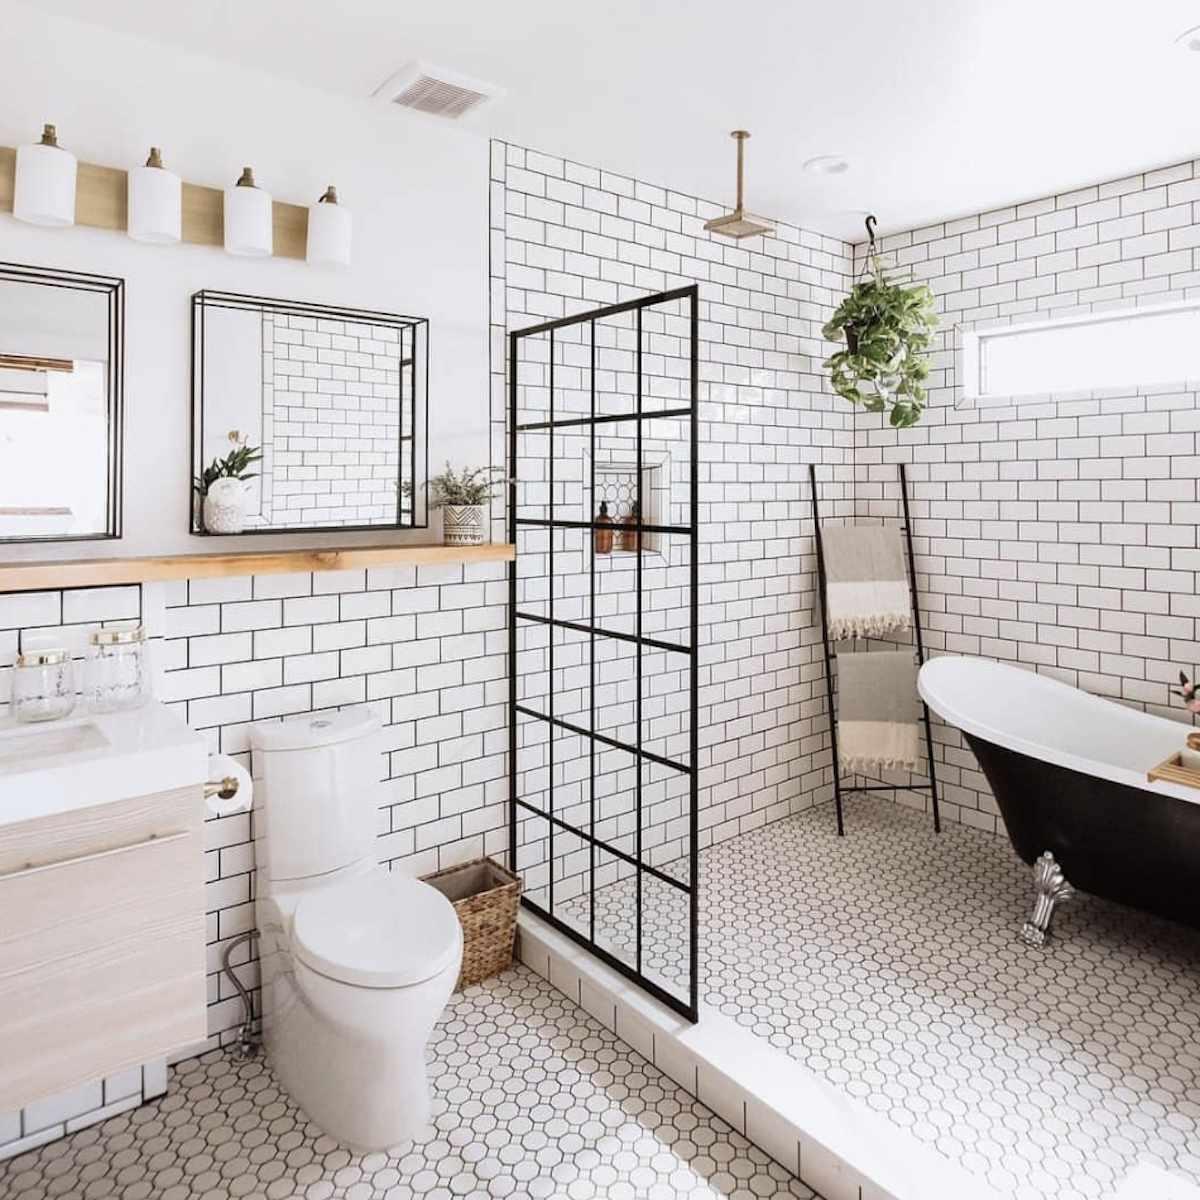 modern subway tile bathroom with black clawfoot bathtub, black ladder holding towels propped up in corner